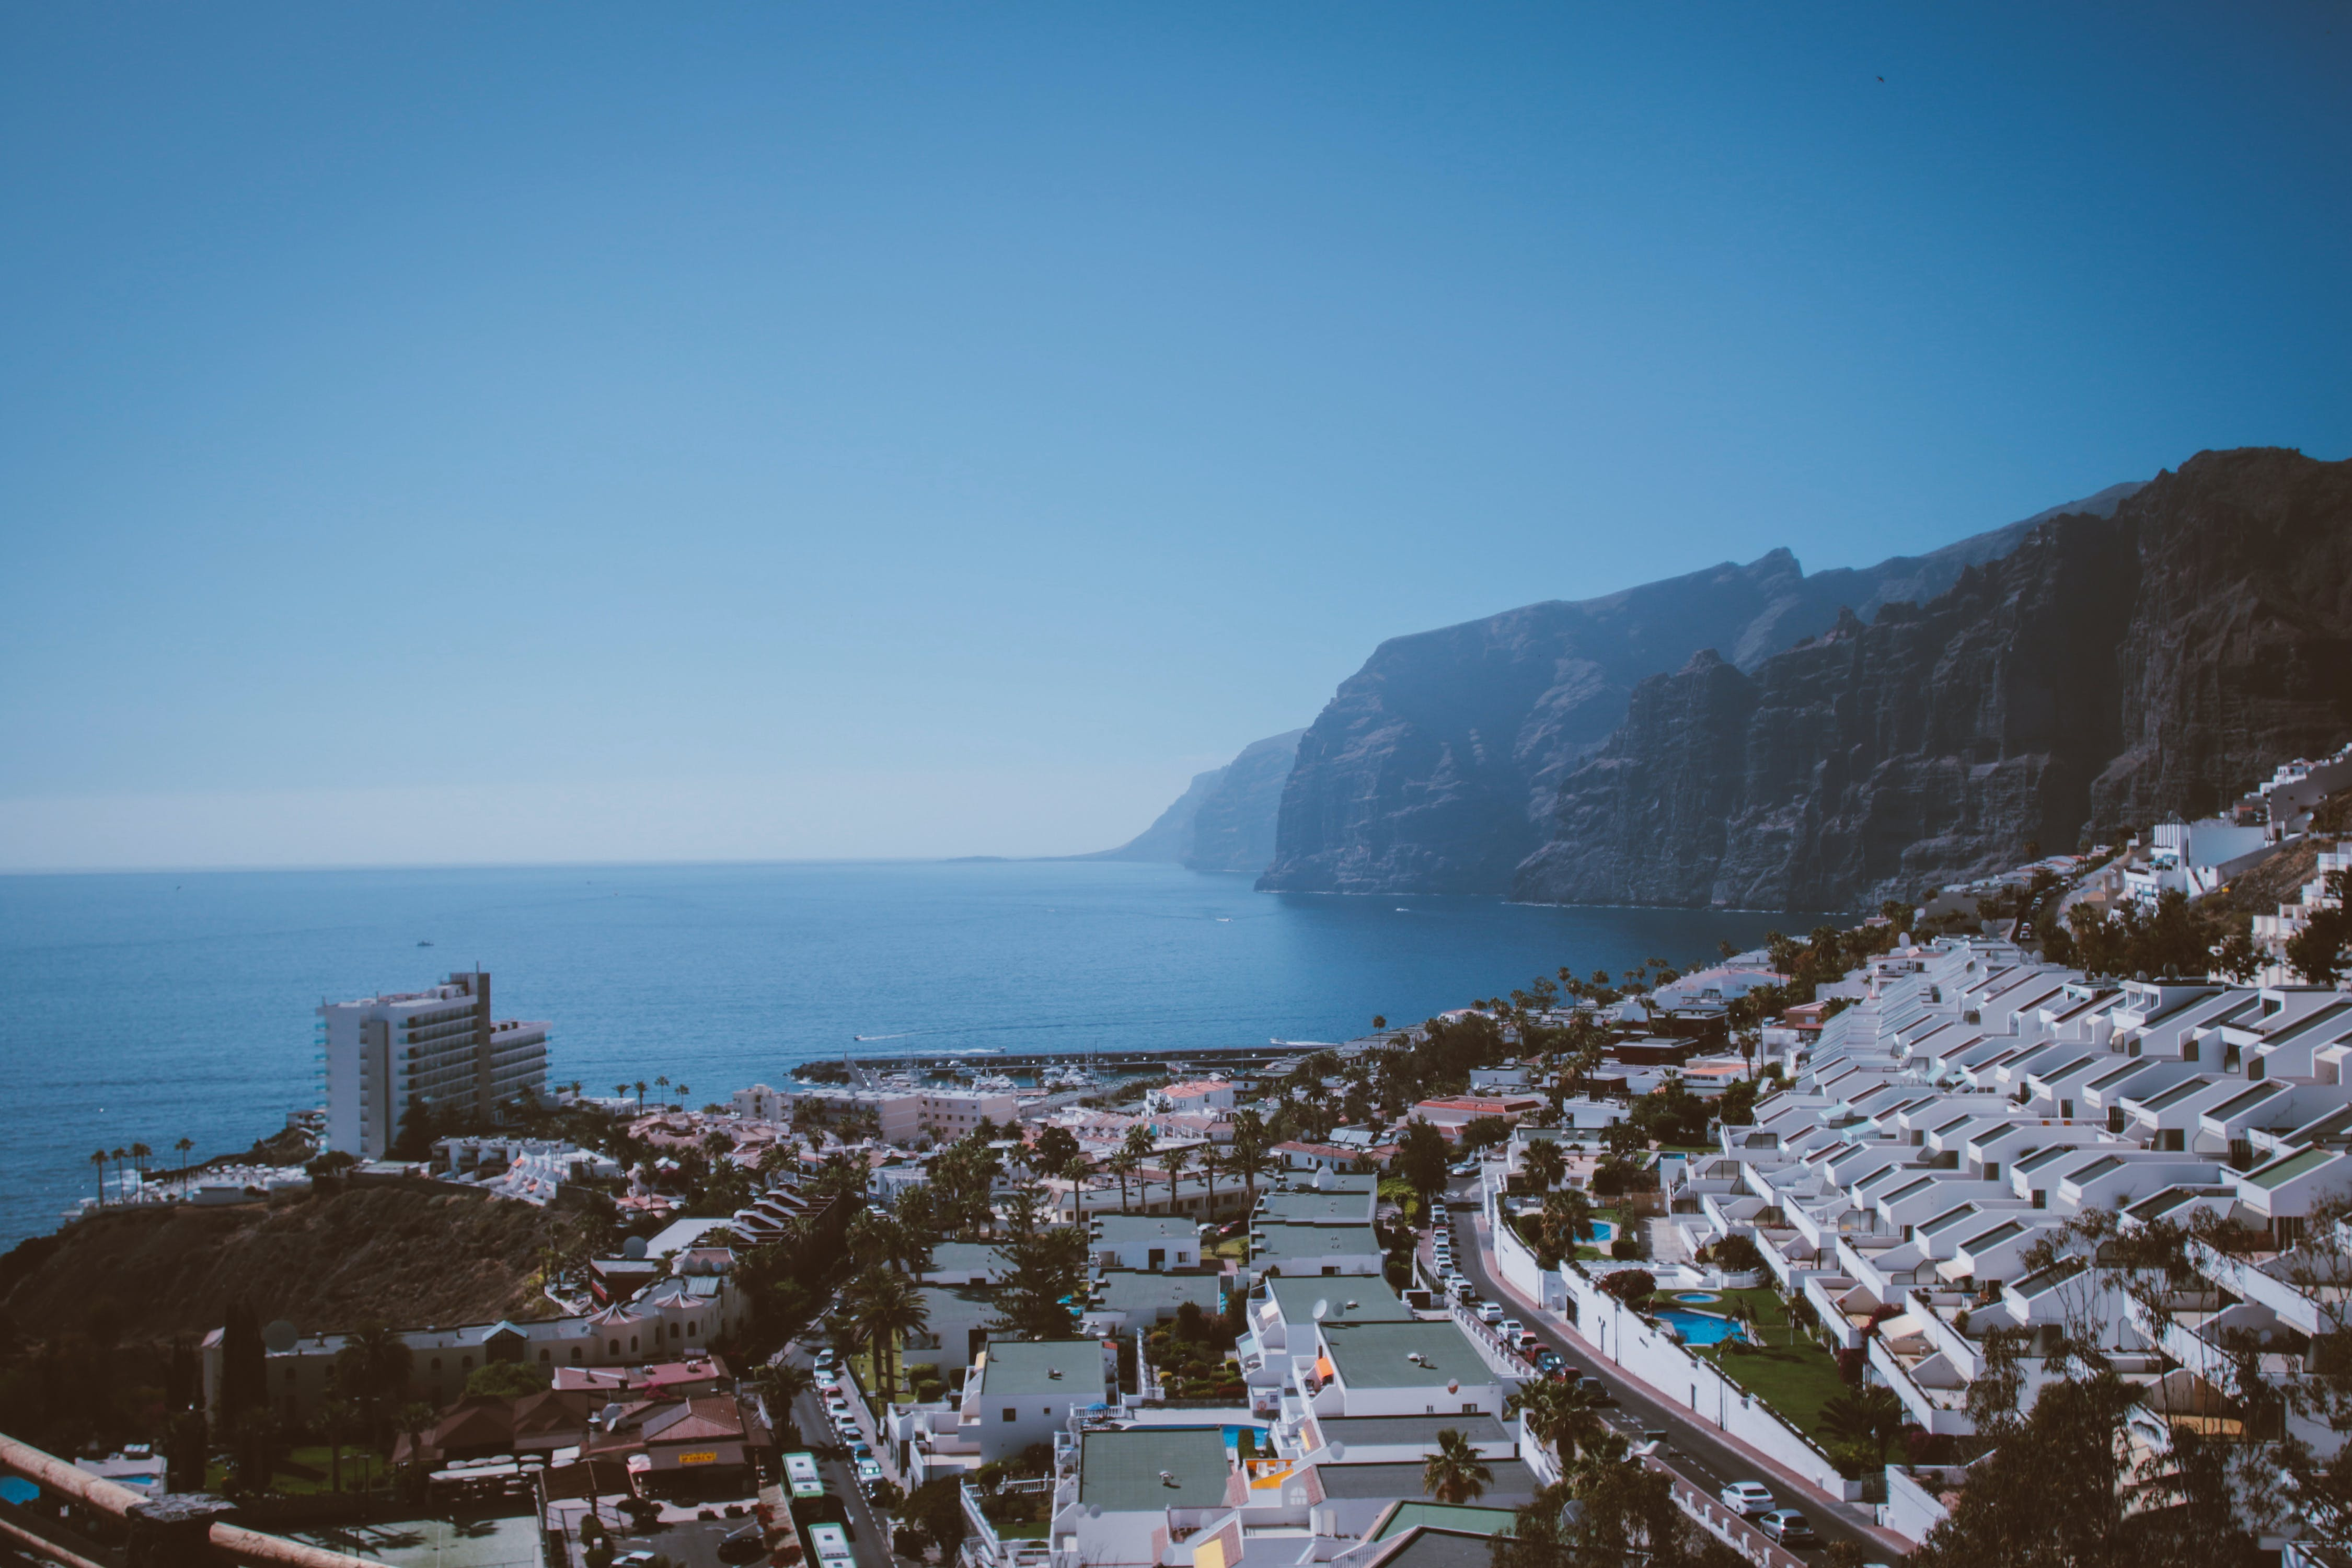 High-angle Photography of Building Beside Seashore